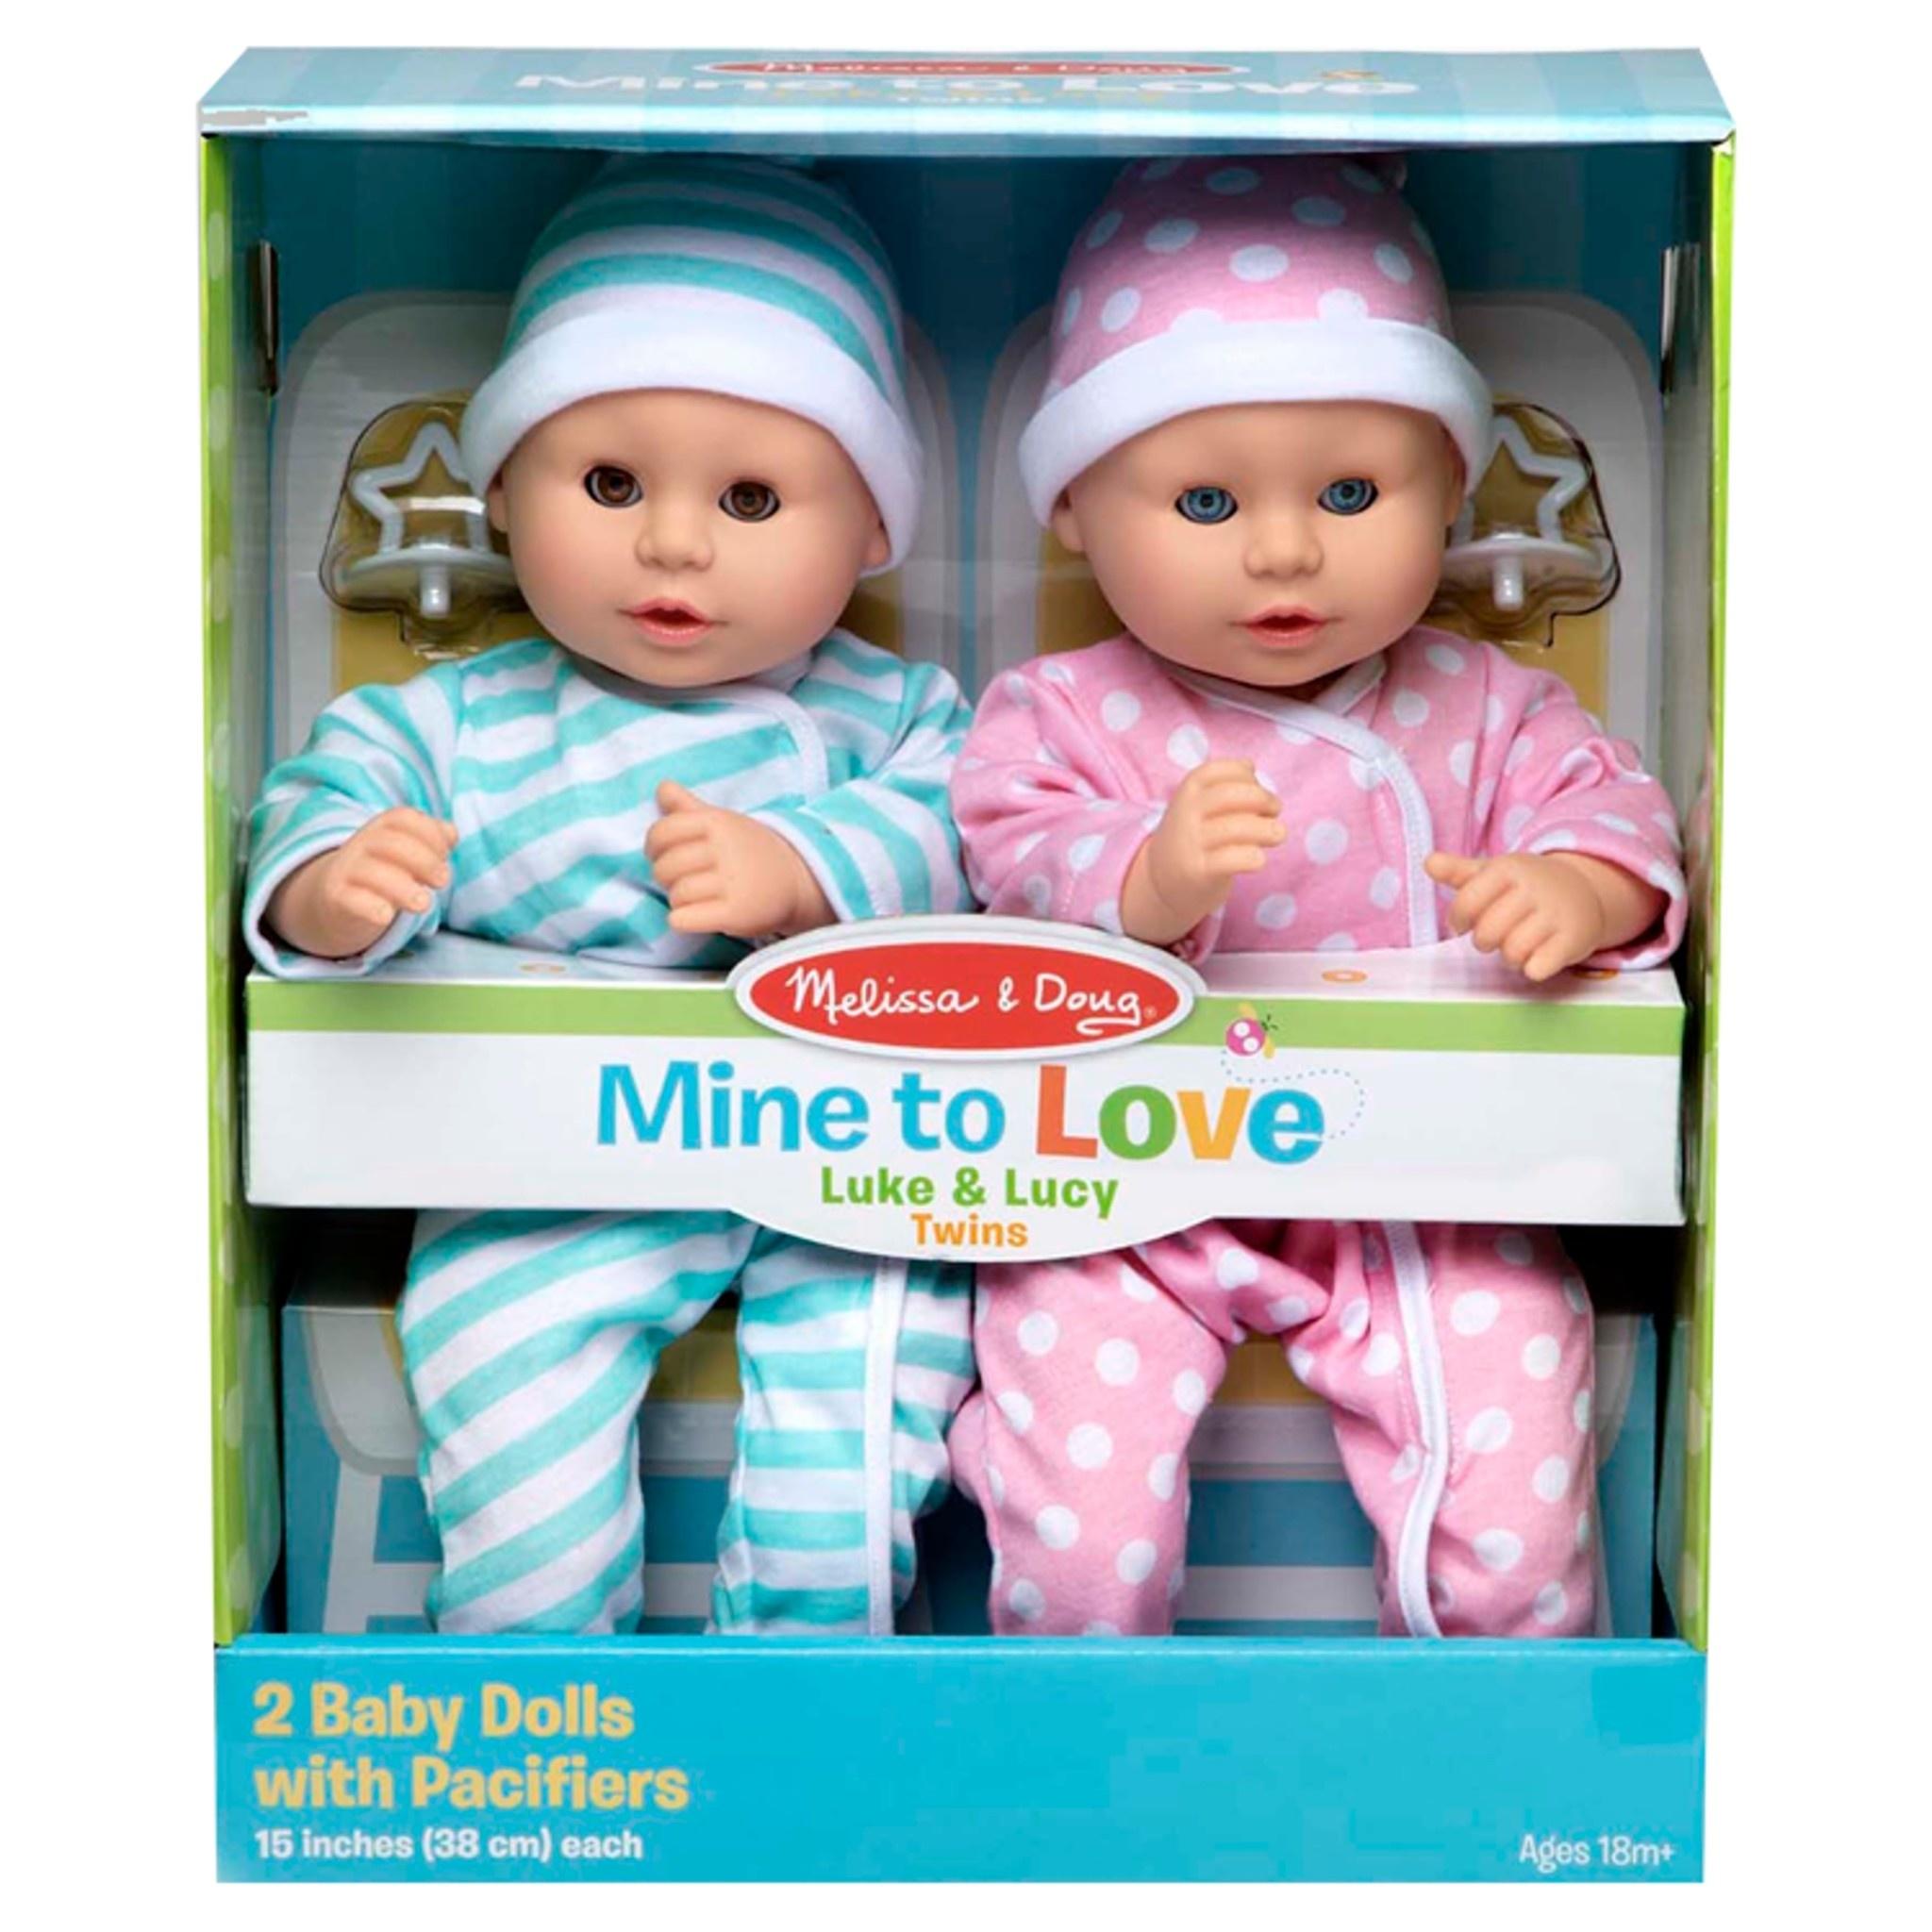 Mine to Love Twin Dolls Luke & Lucy-2